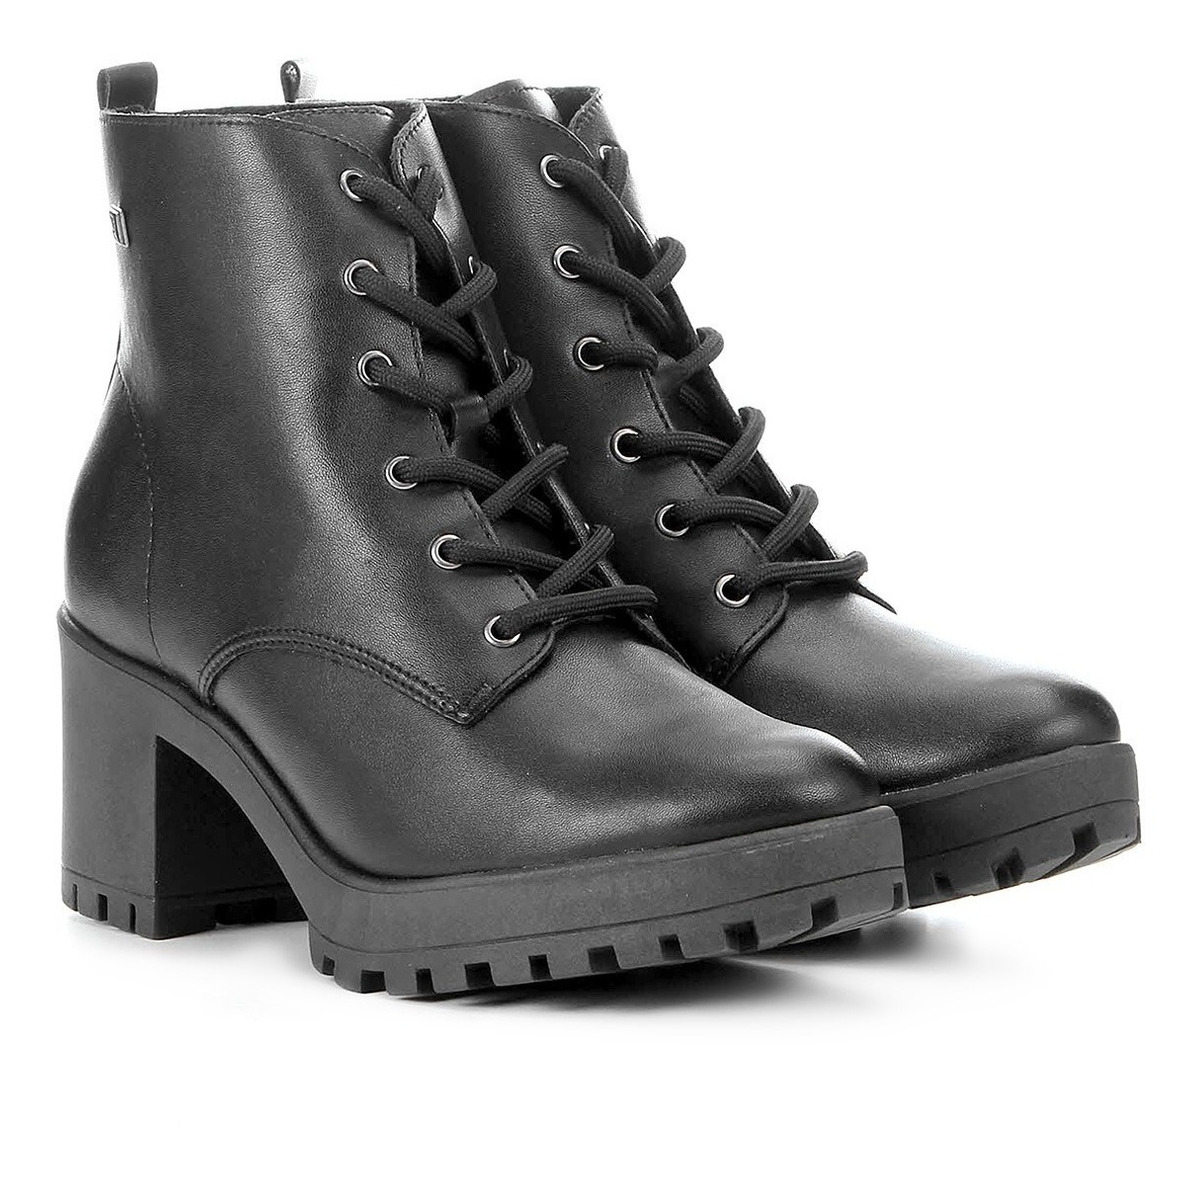 2f26d2099 bota coturno ramarim ankle boot 1956101 preto original. Carregando zoom.